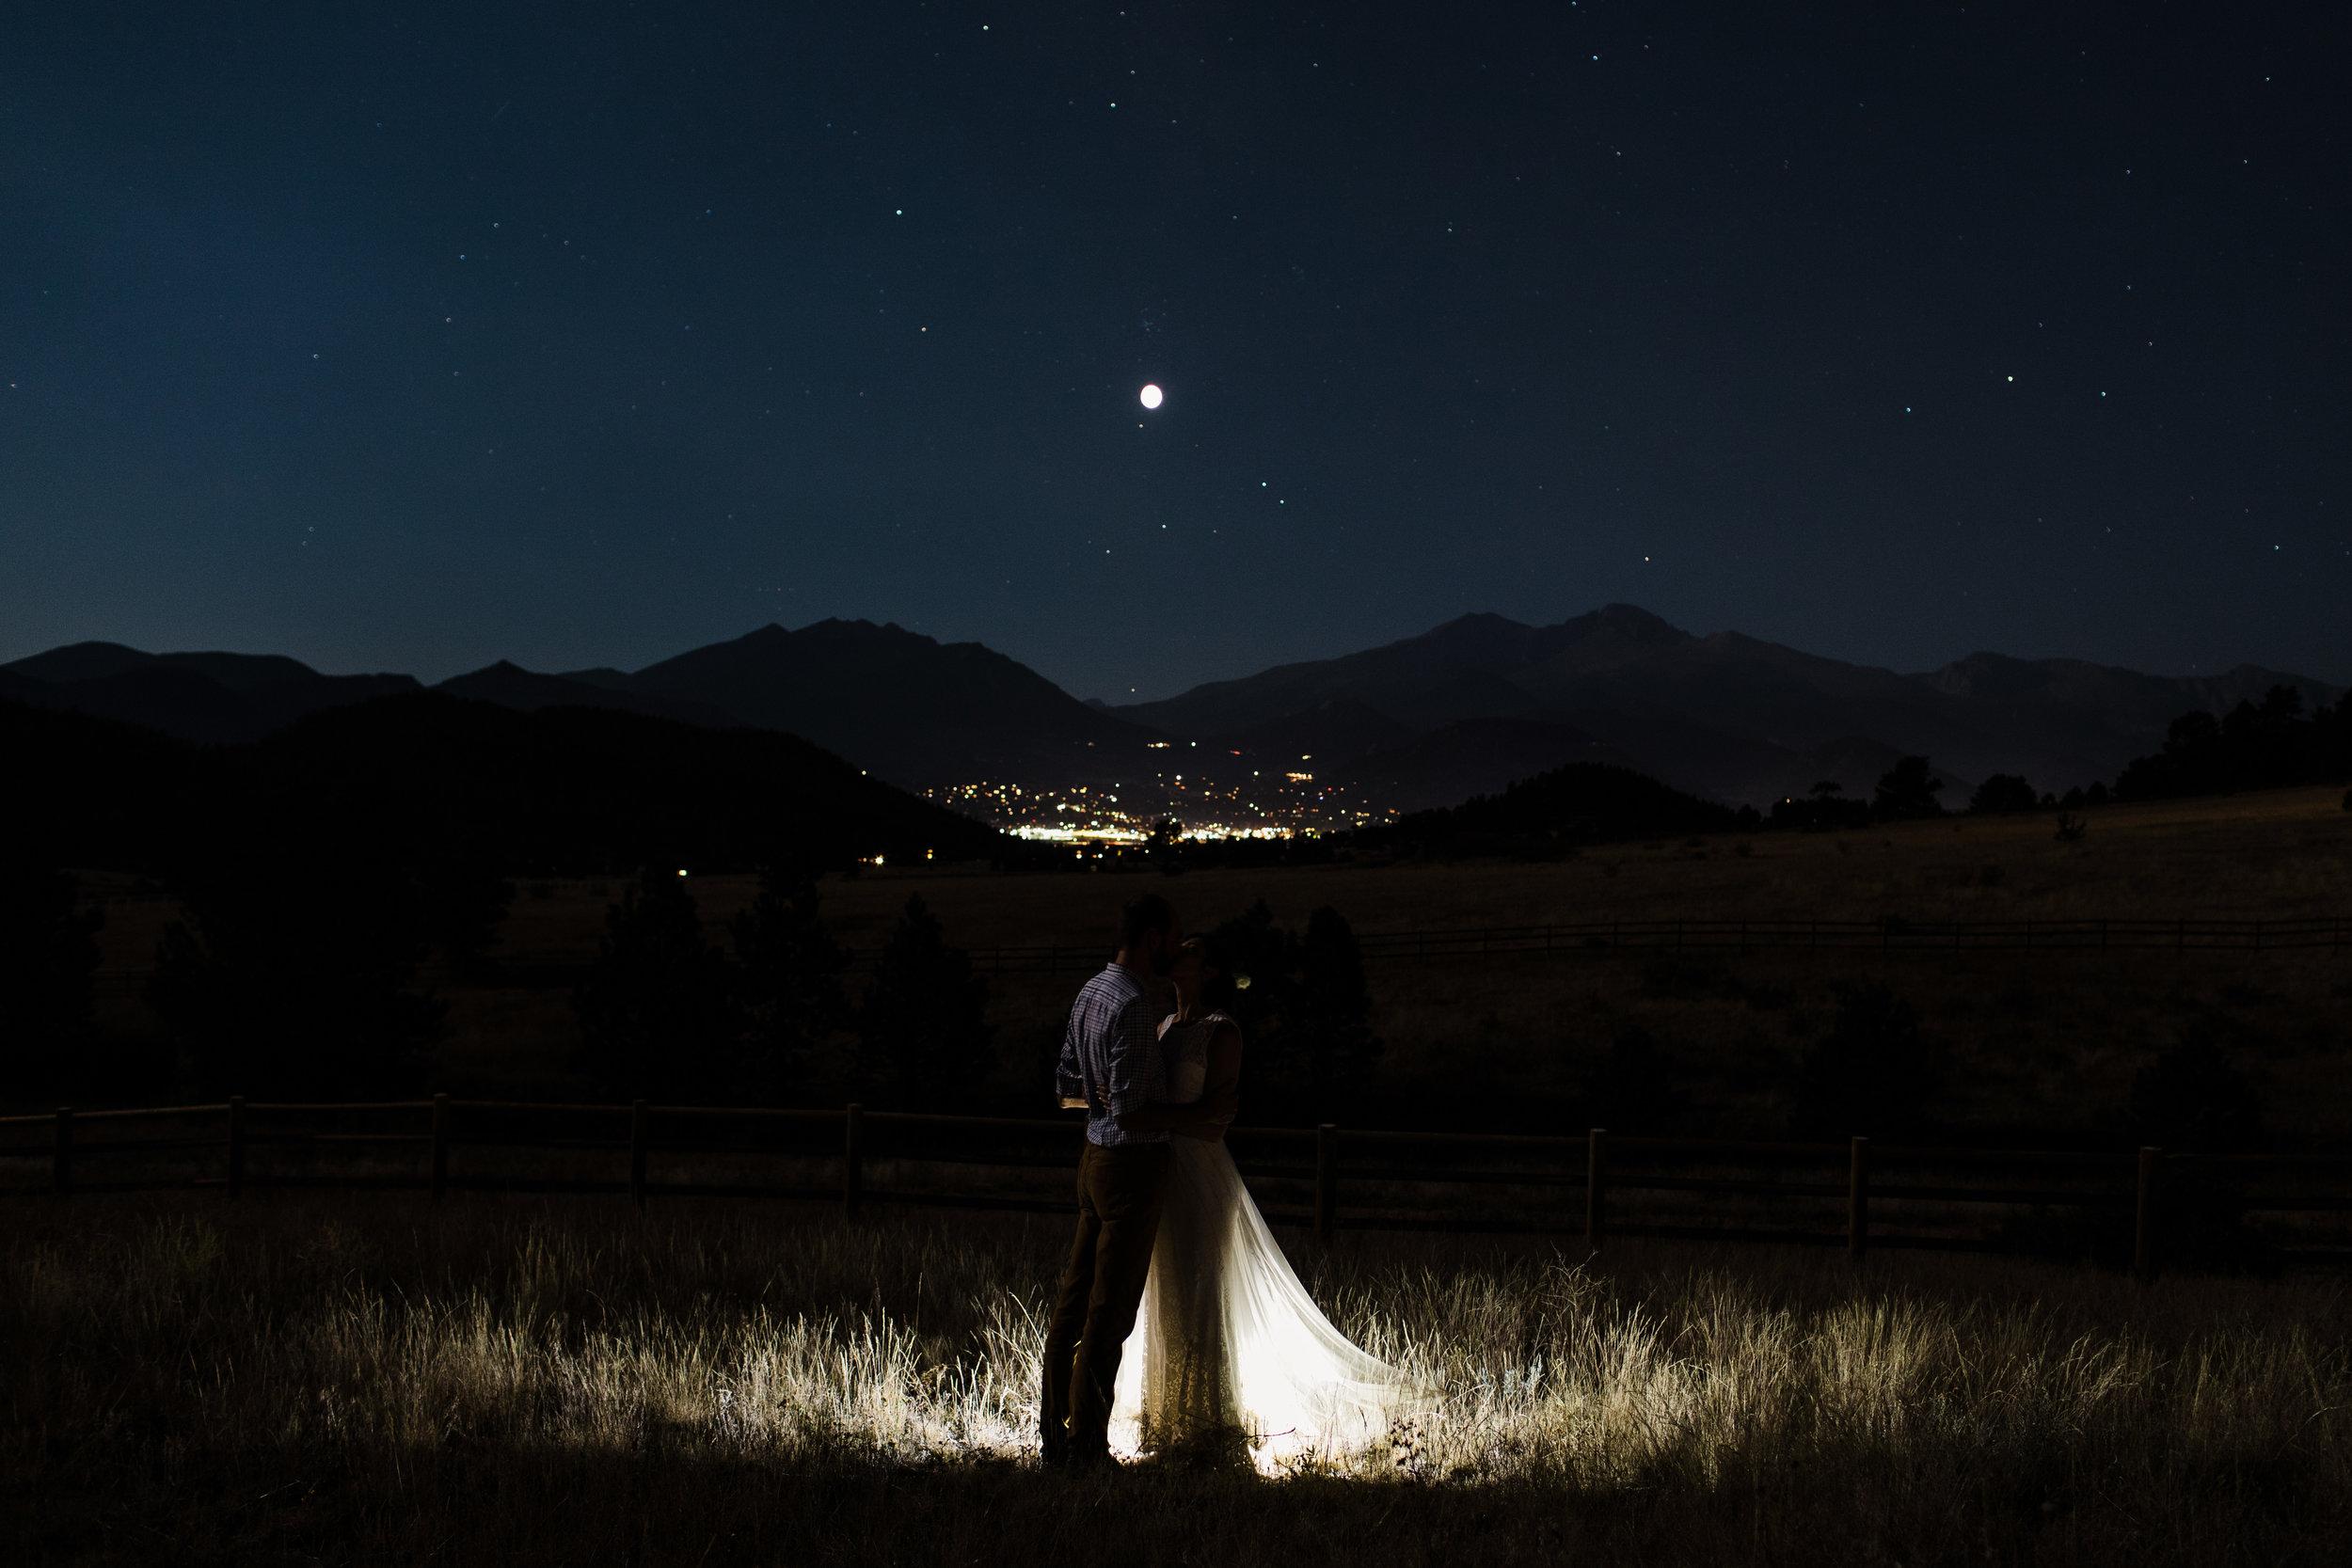 Full moon Rocky Mountain elopement at night | Colorado adventure wedding photographer